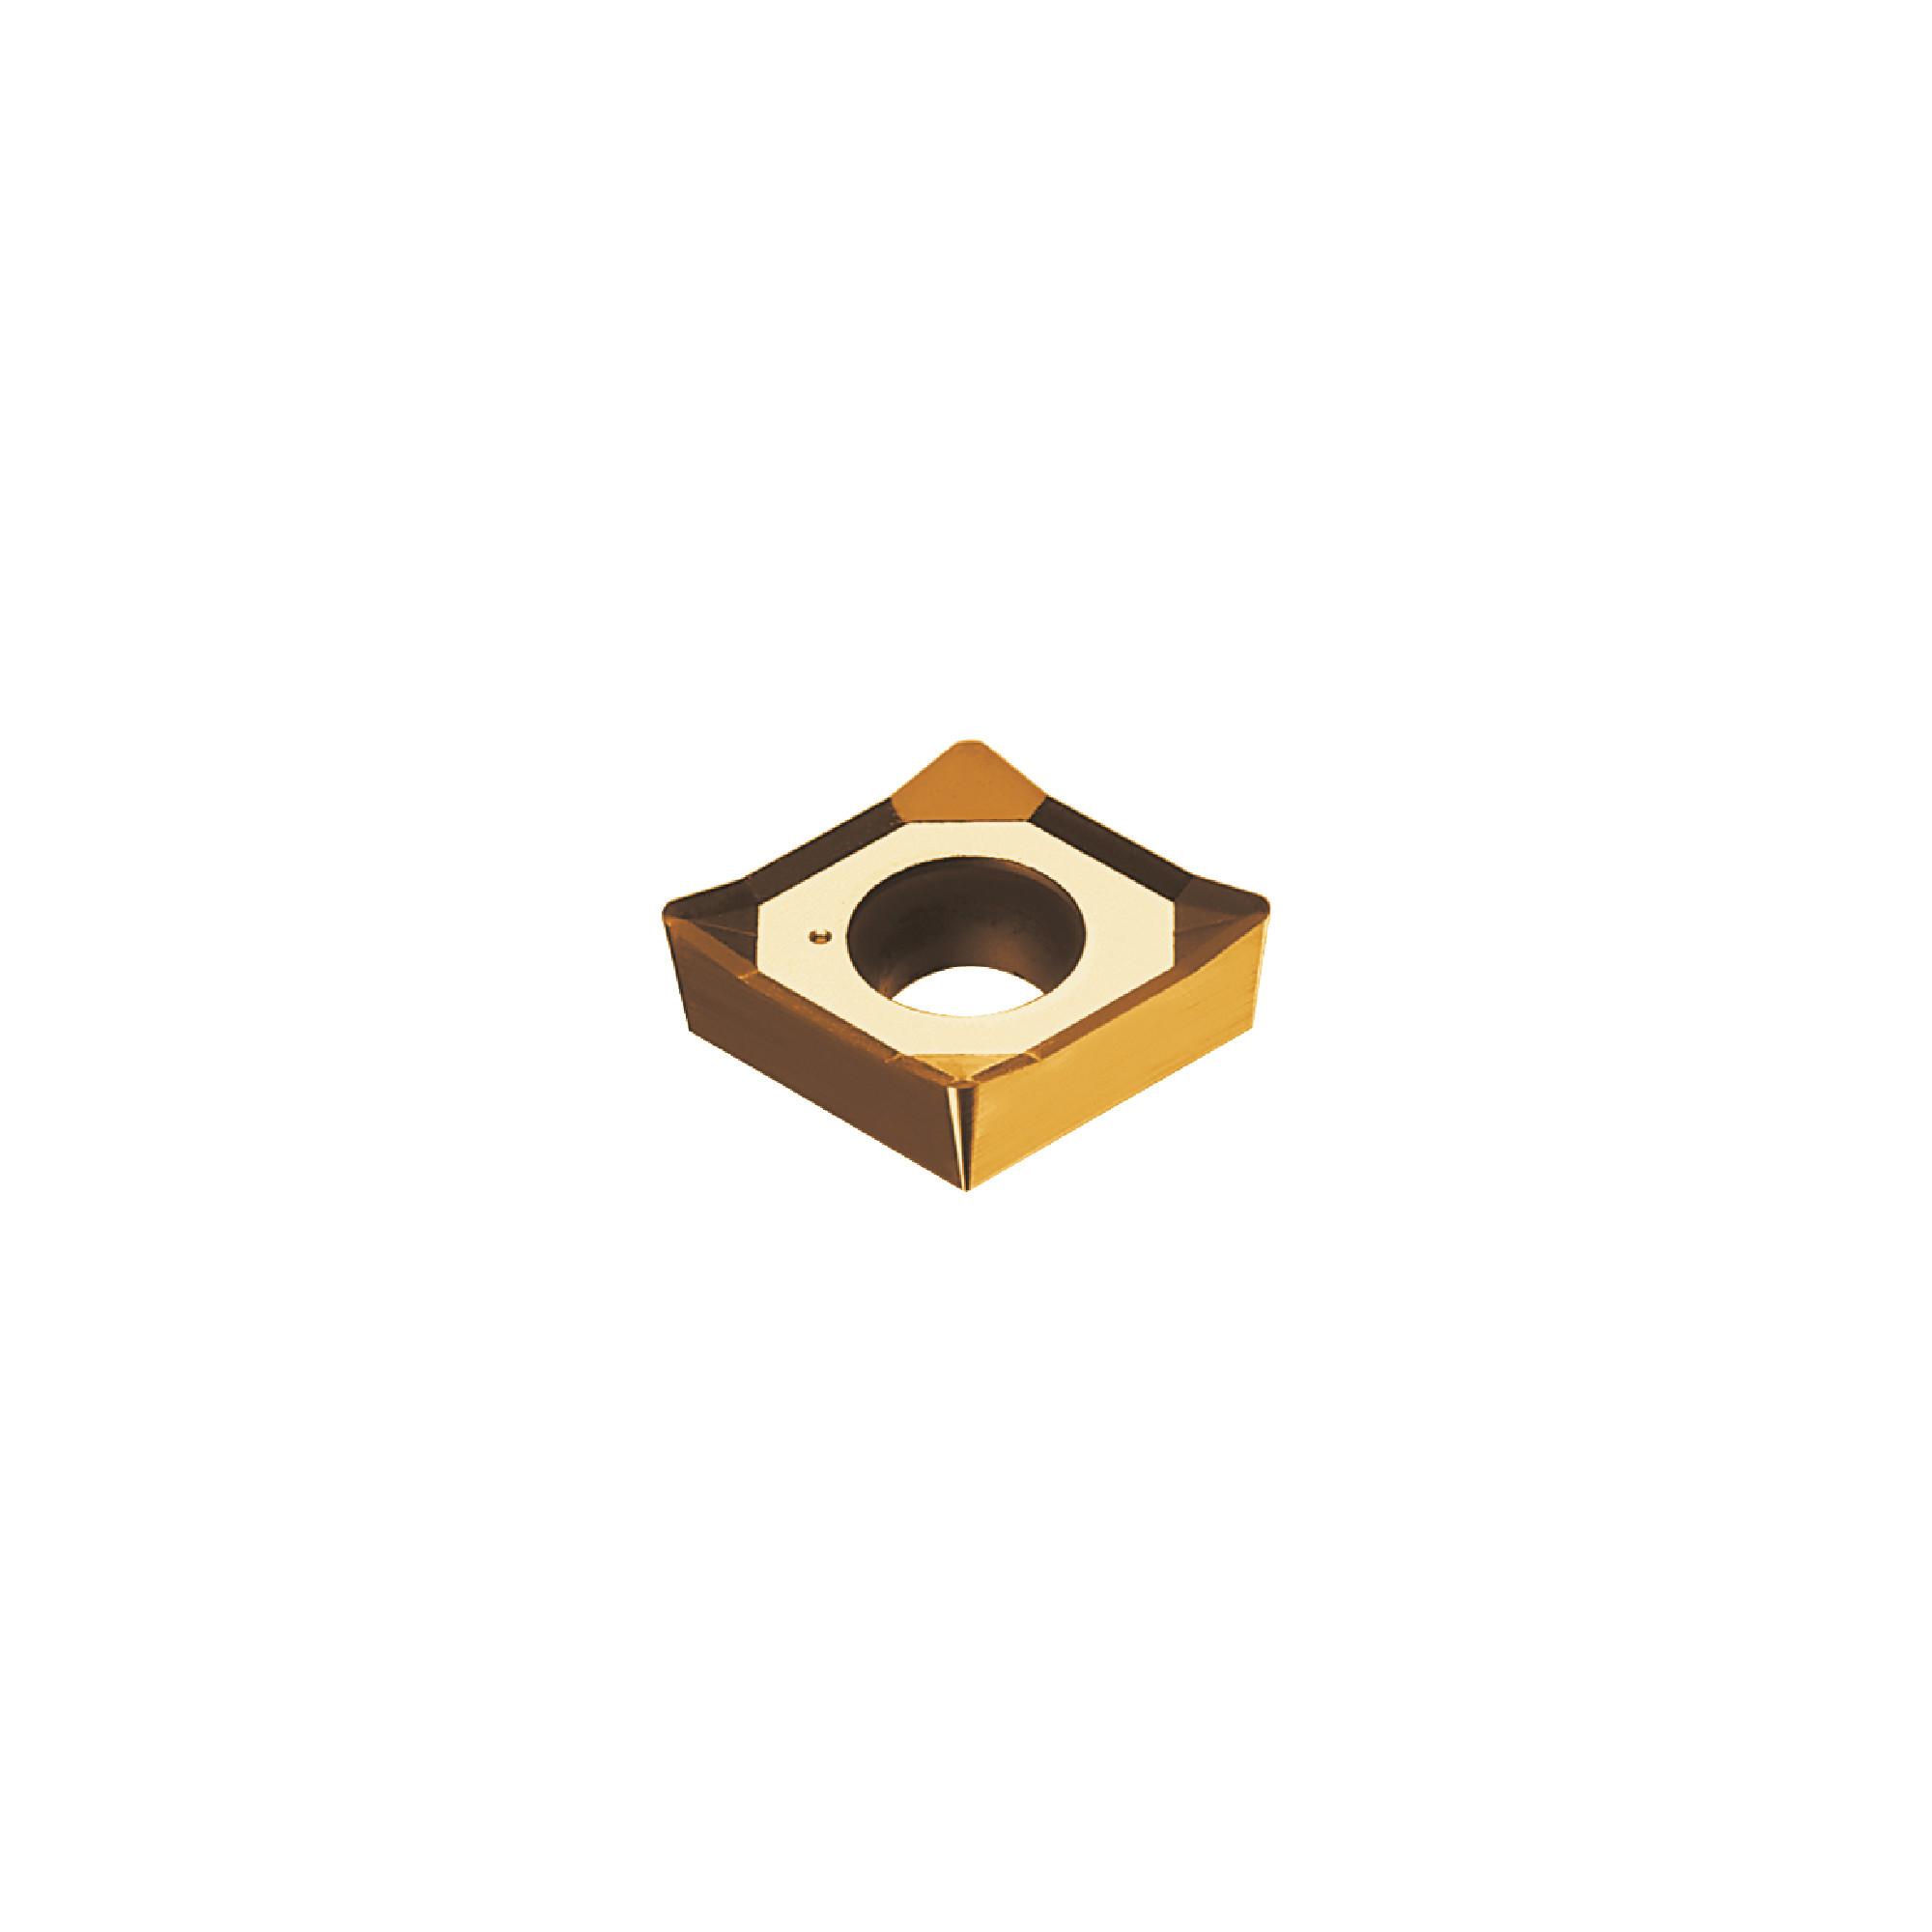 ARNO - CCGT3(2.5)0.5FN-ALU PVD1 - 80° Diamond / Indexable Carbide Turning Insert